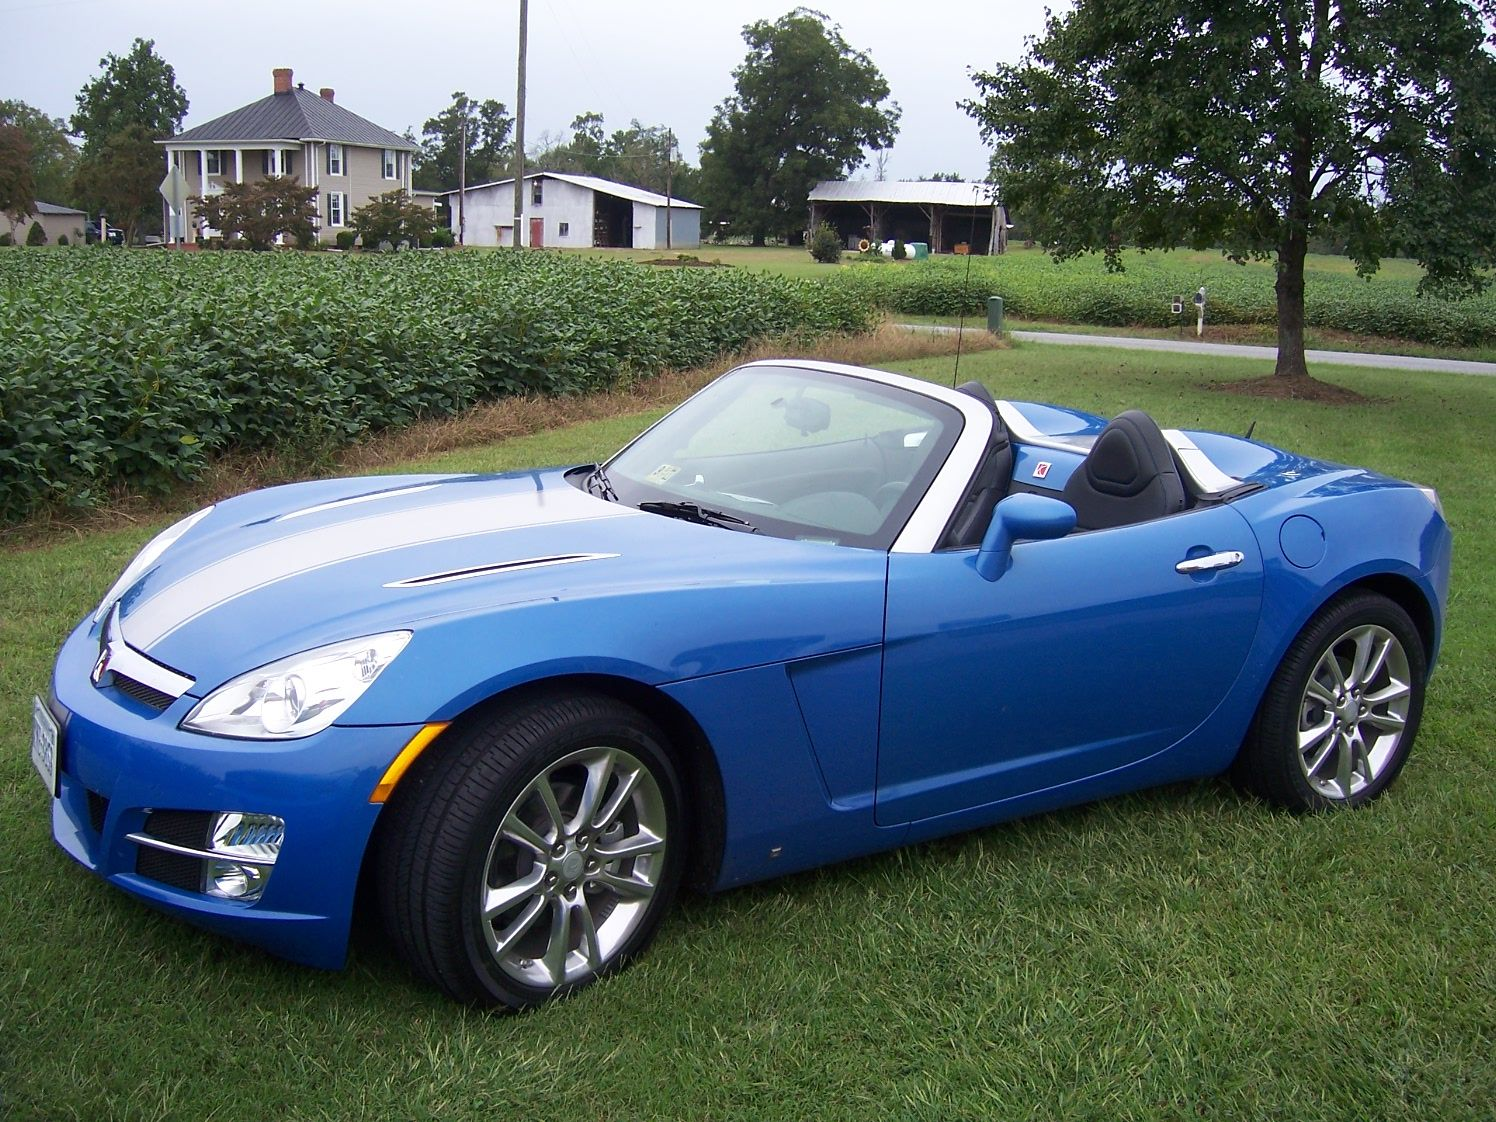 hydro blue 2009 limited edition saturn sky for sale saturn sky cars pinterest dream. Black Bedroom Furniture Sets. Home Design Ideas